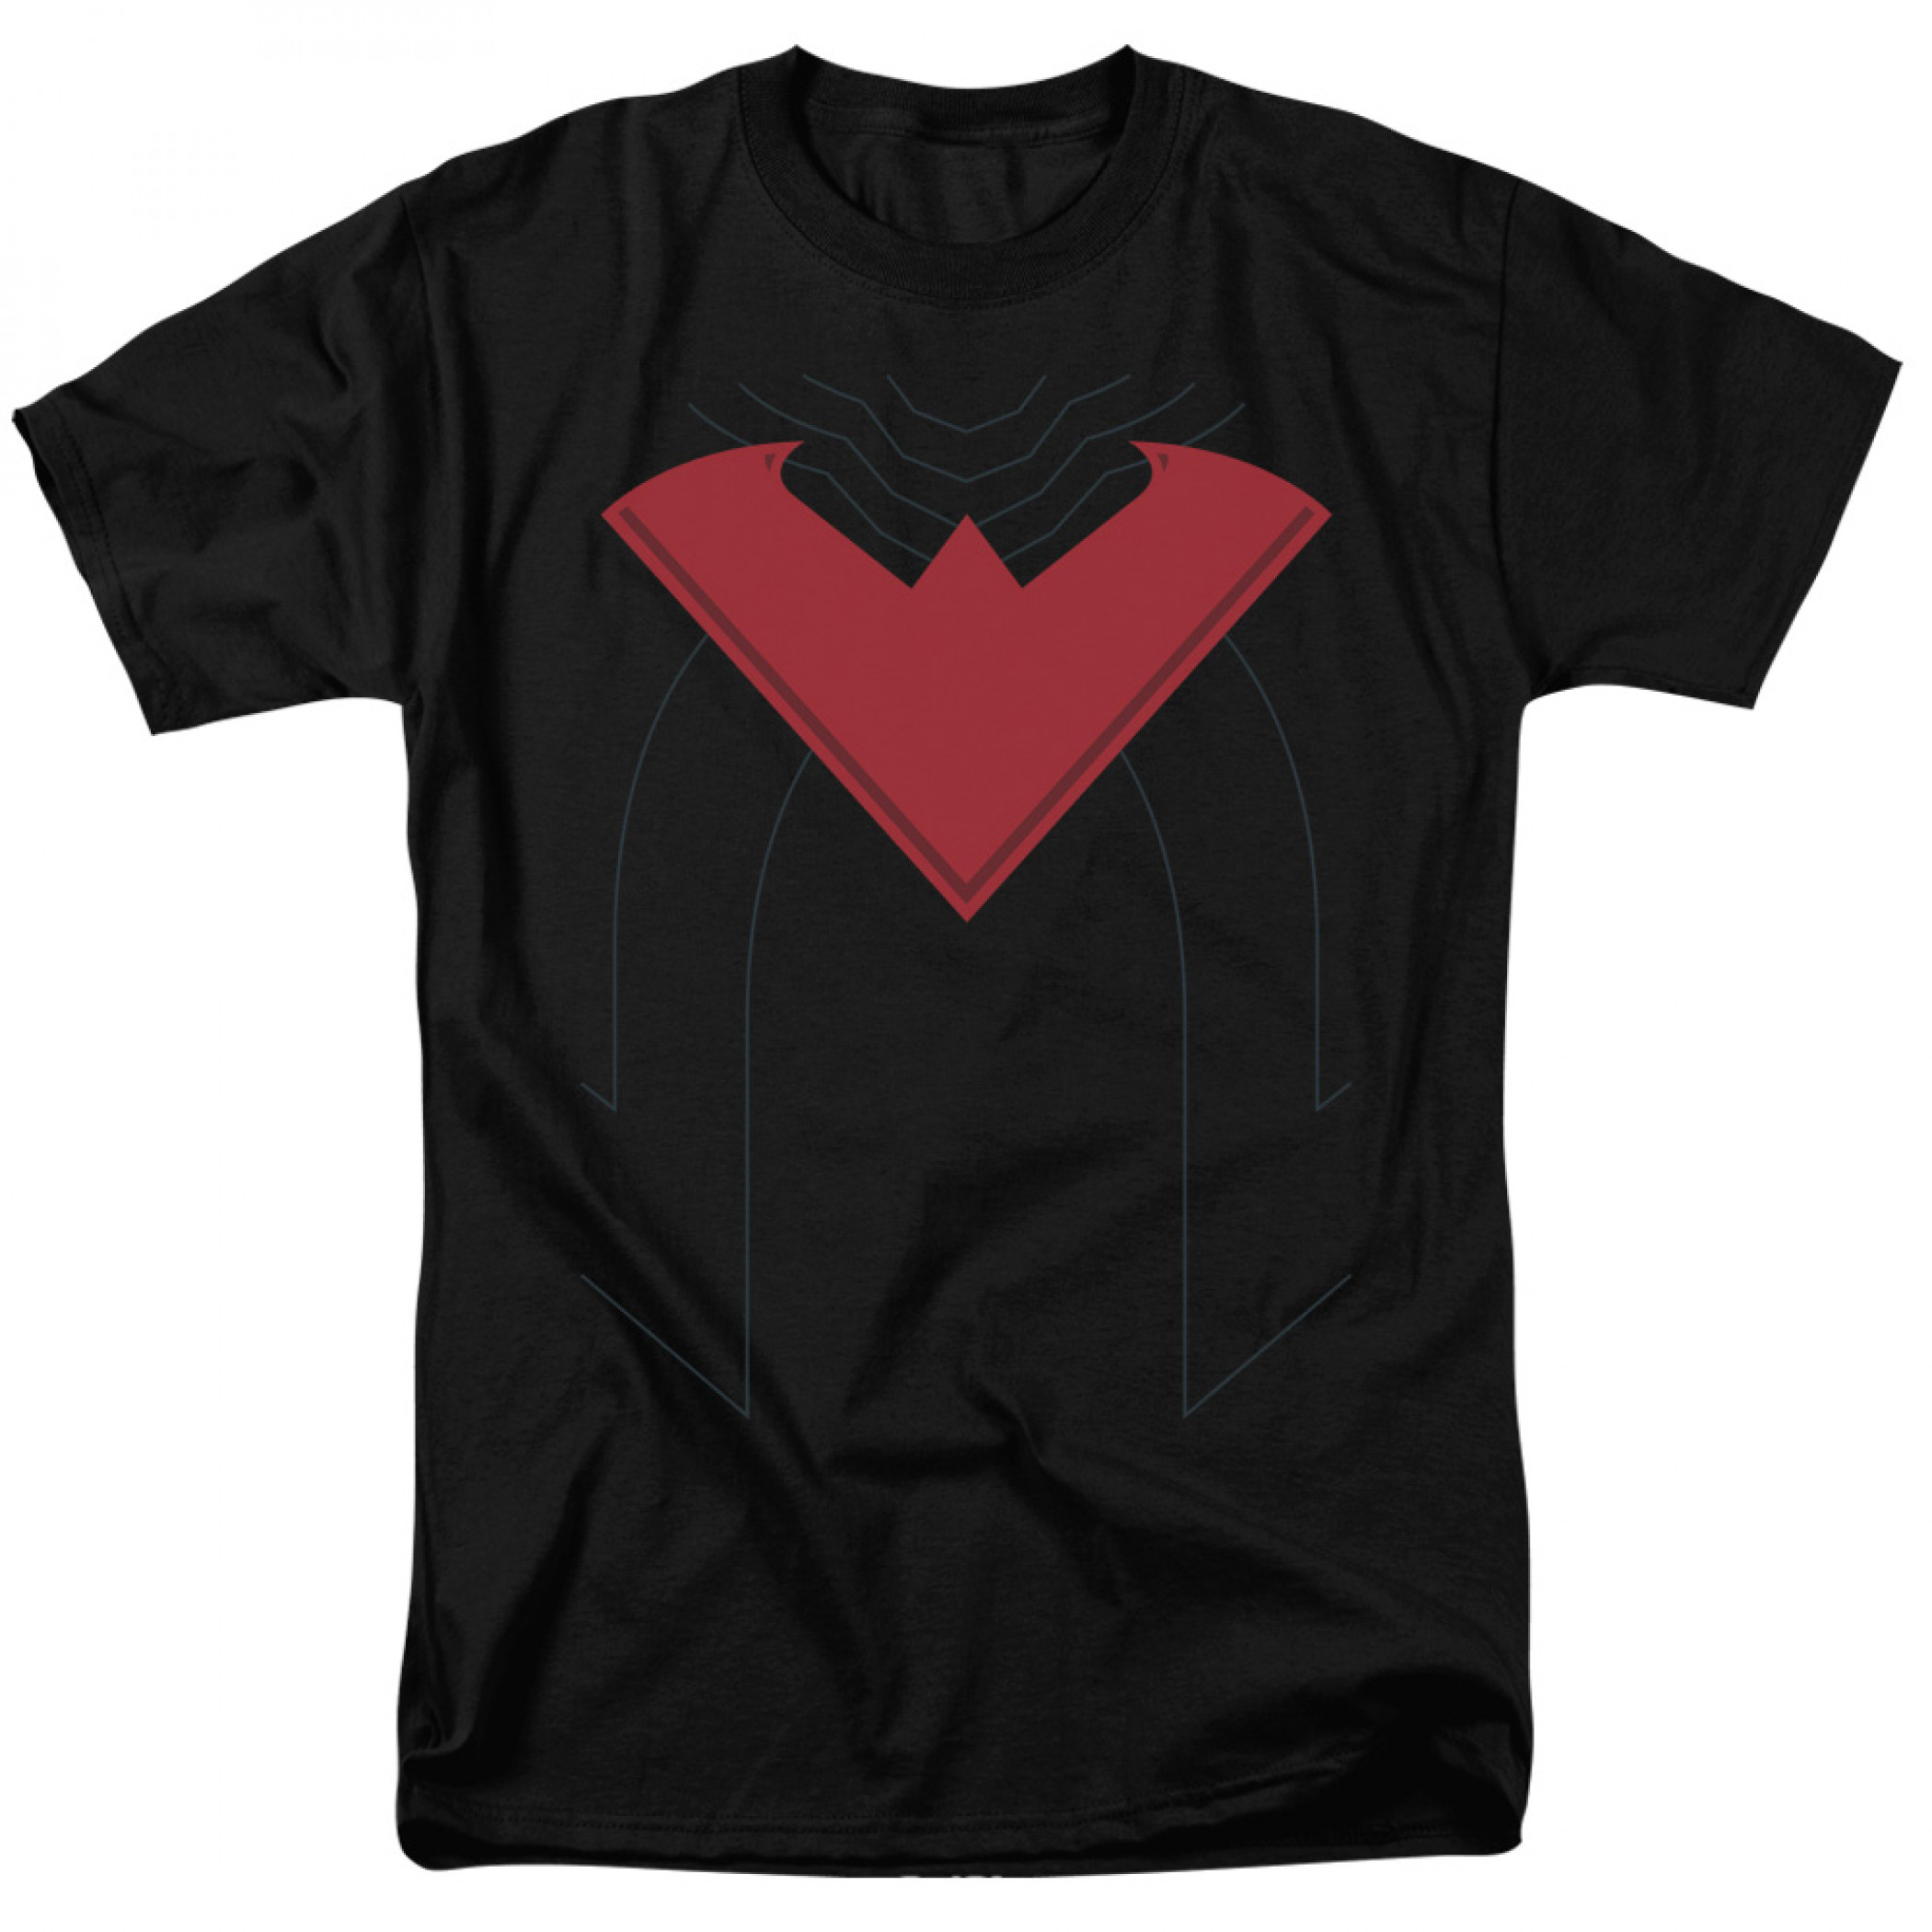 Nightwing Red Symbol Costume T-Shirt